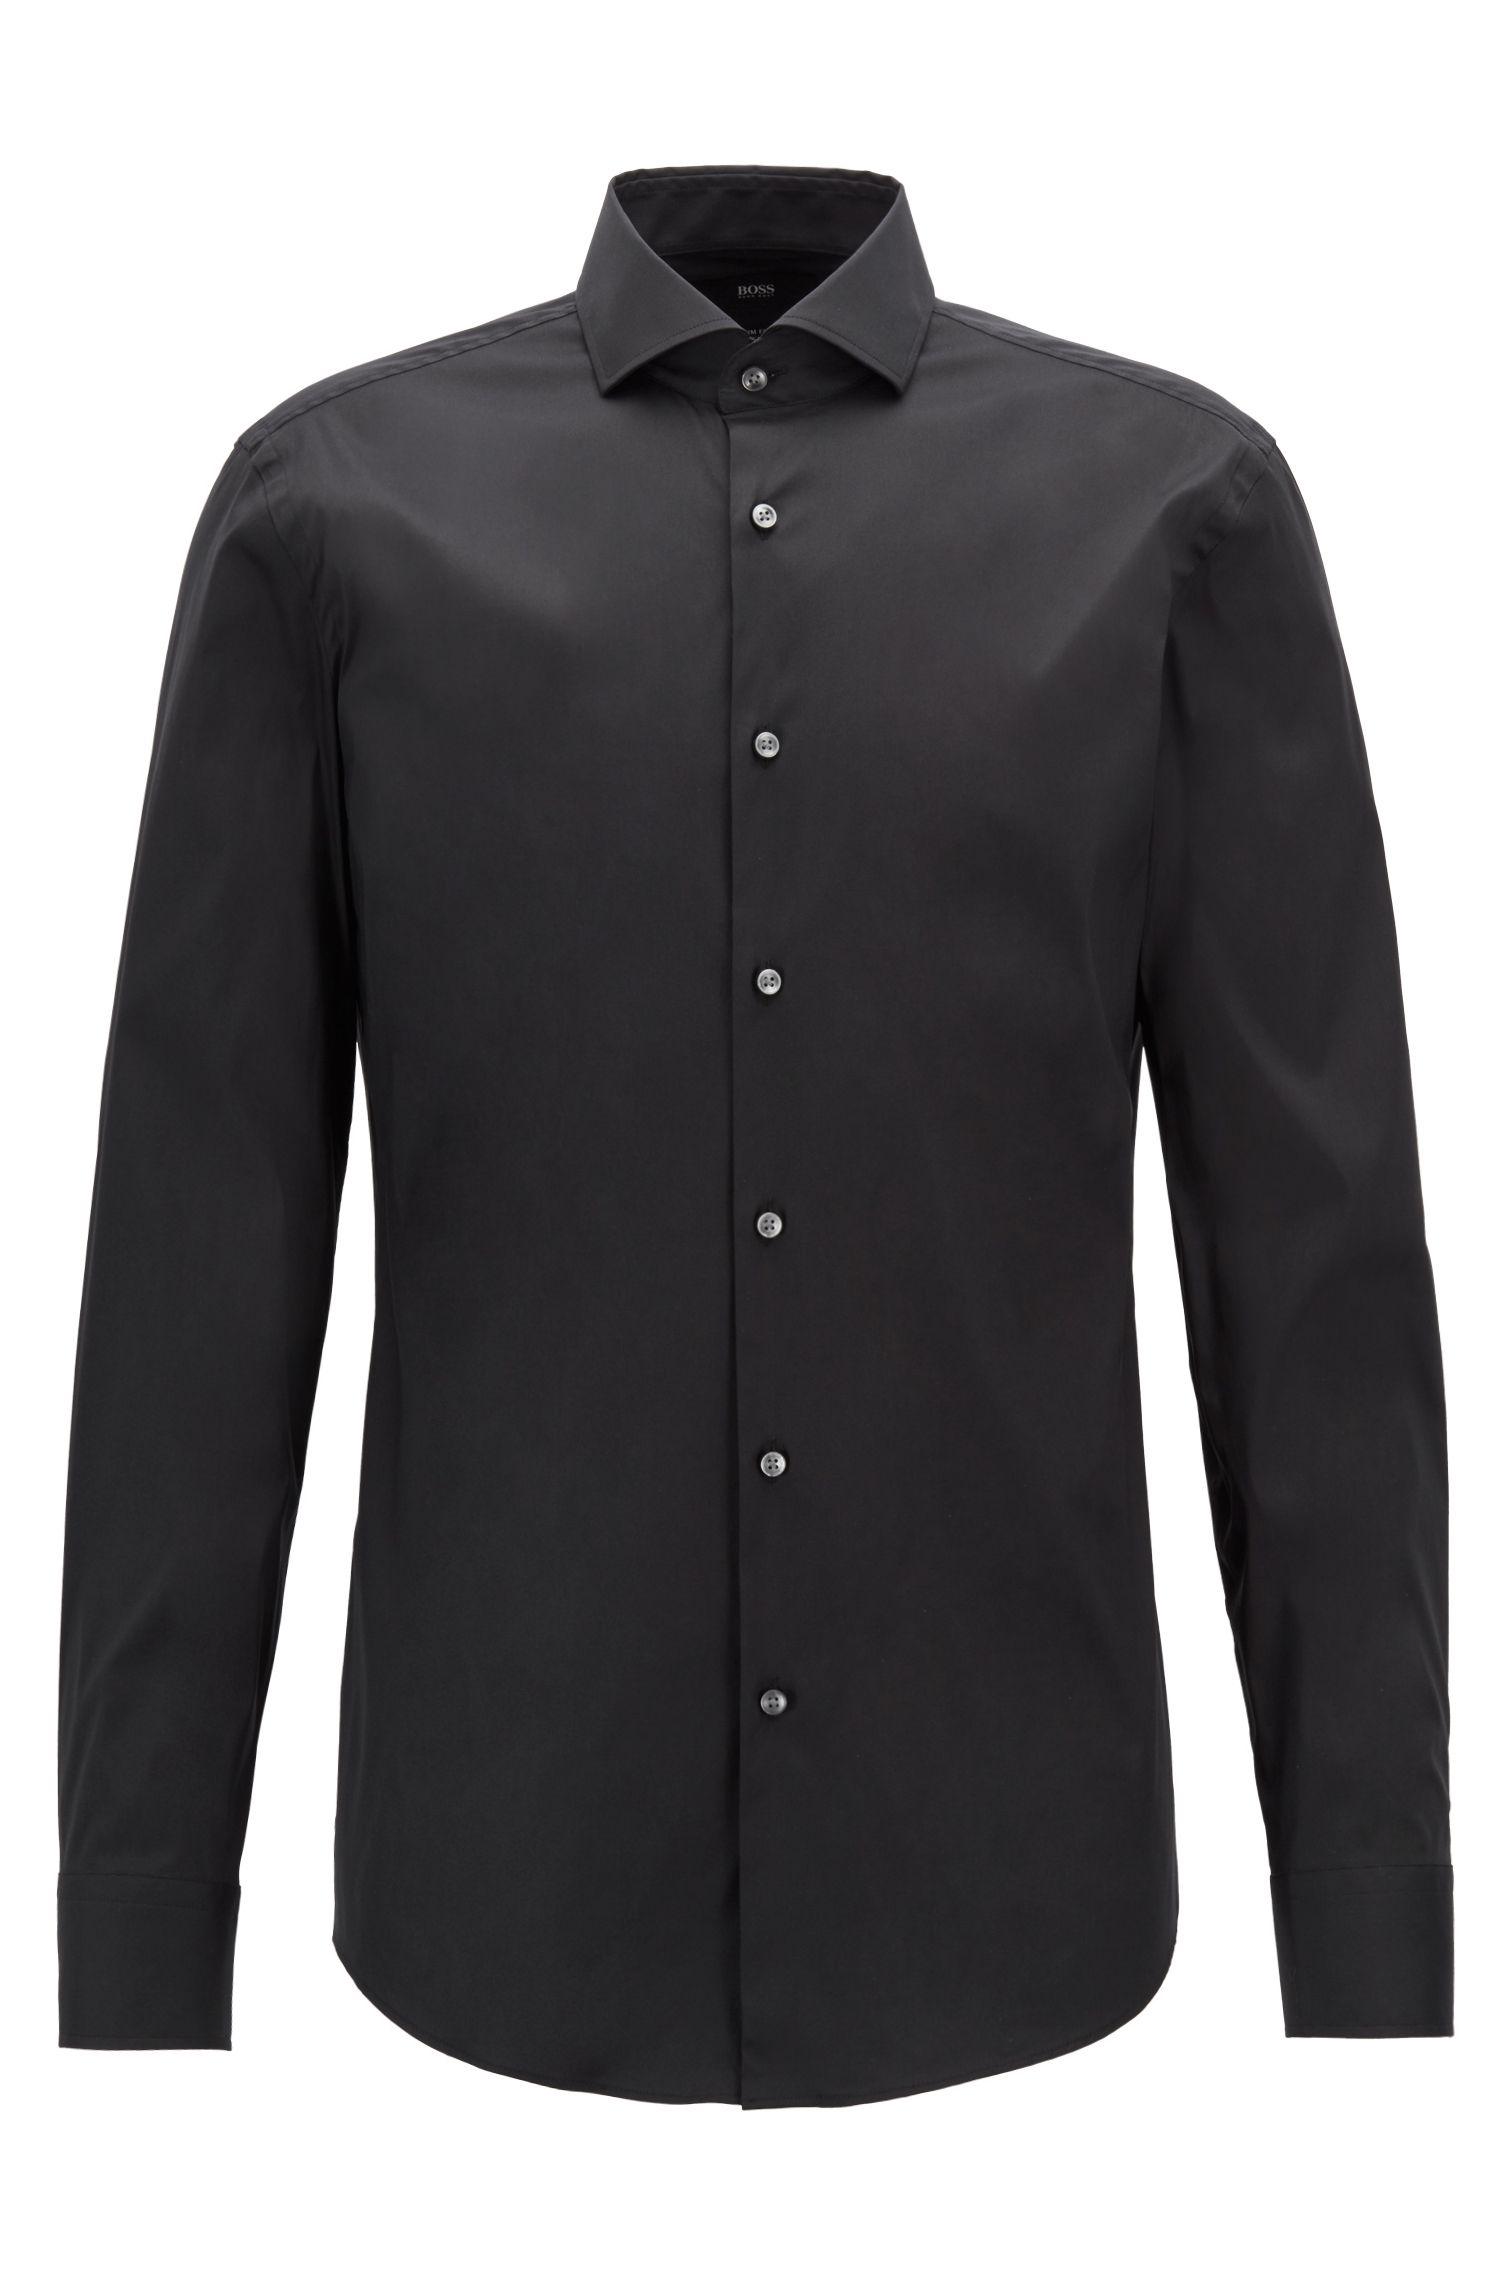 Stretch Cotton Dress Shirt with Stretch Tailoring, Slim Fit | Jason, Black